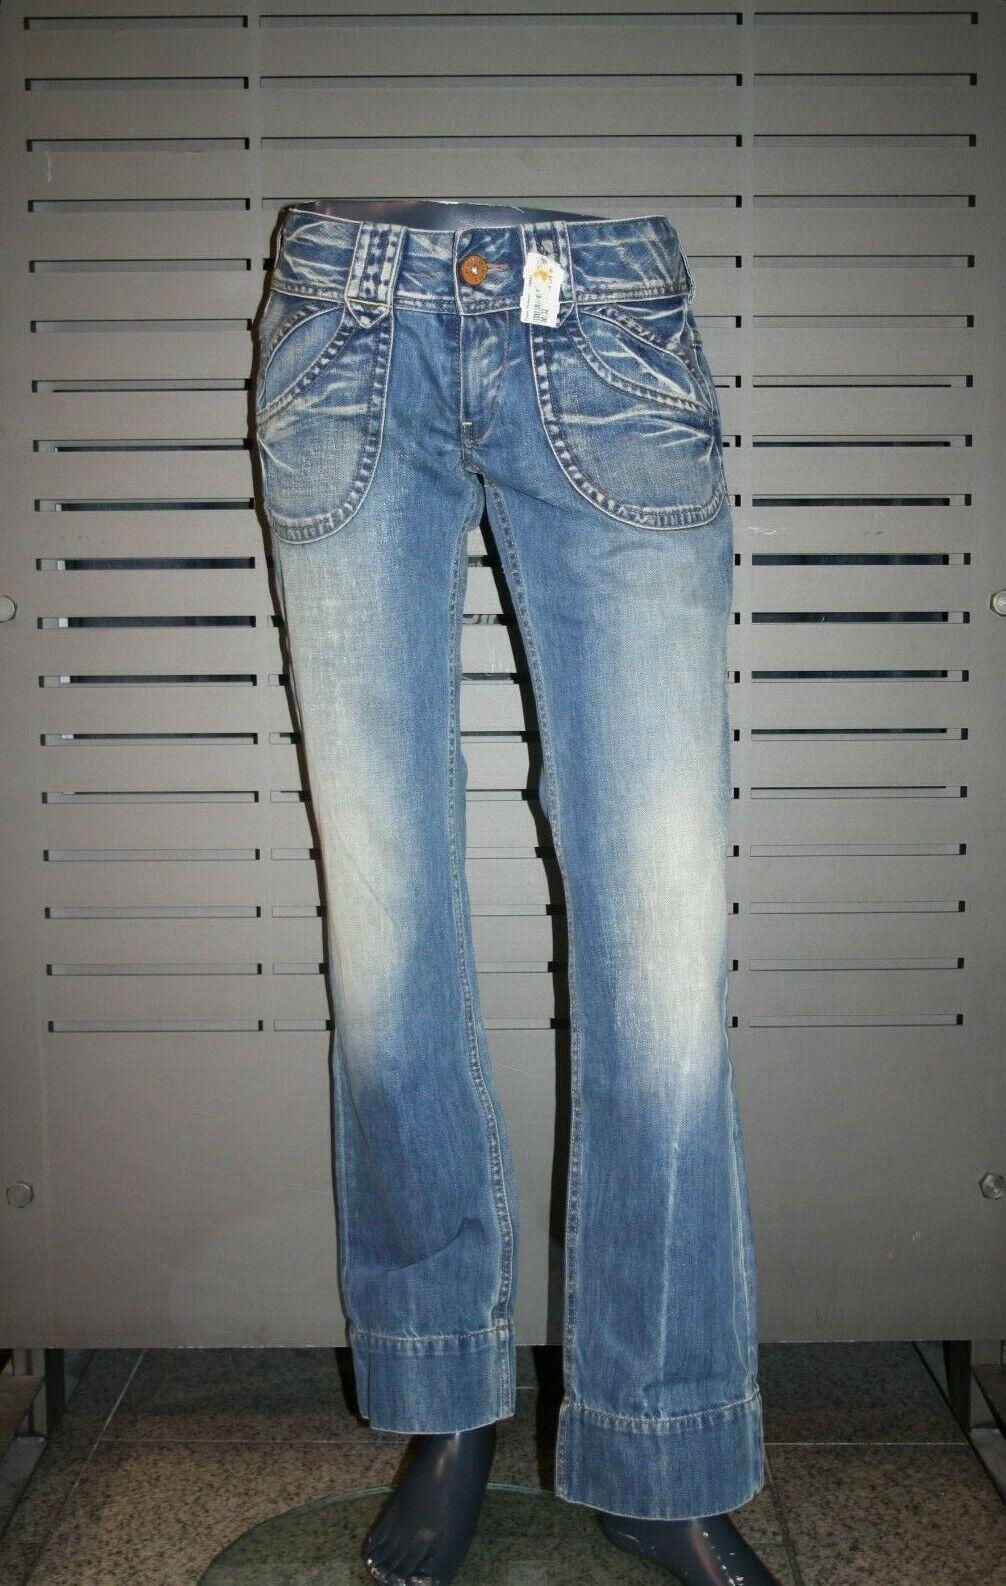 Pepe Jeans London MIdamen Damen low waist  dunkelblau ORIGINAL USED MRT01